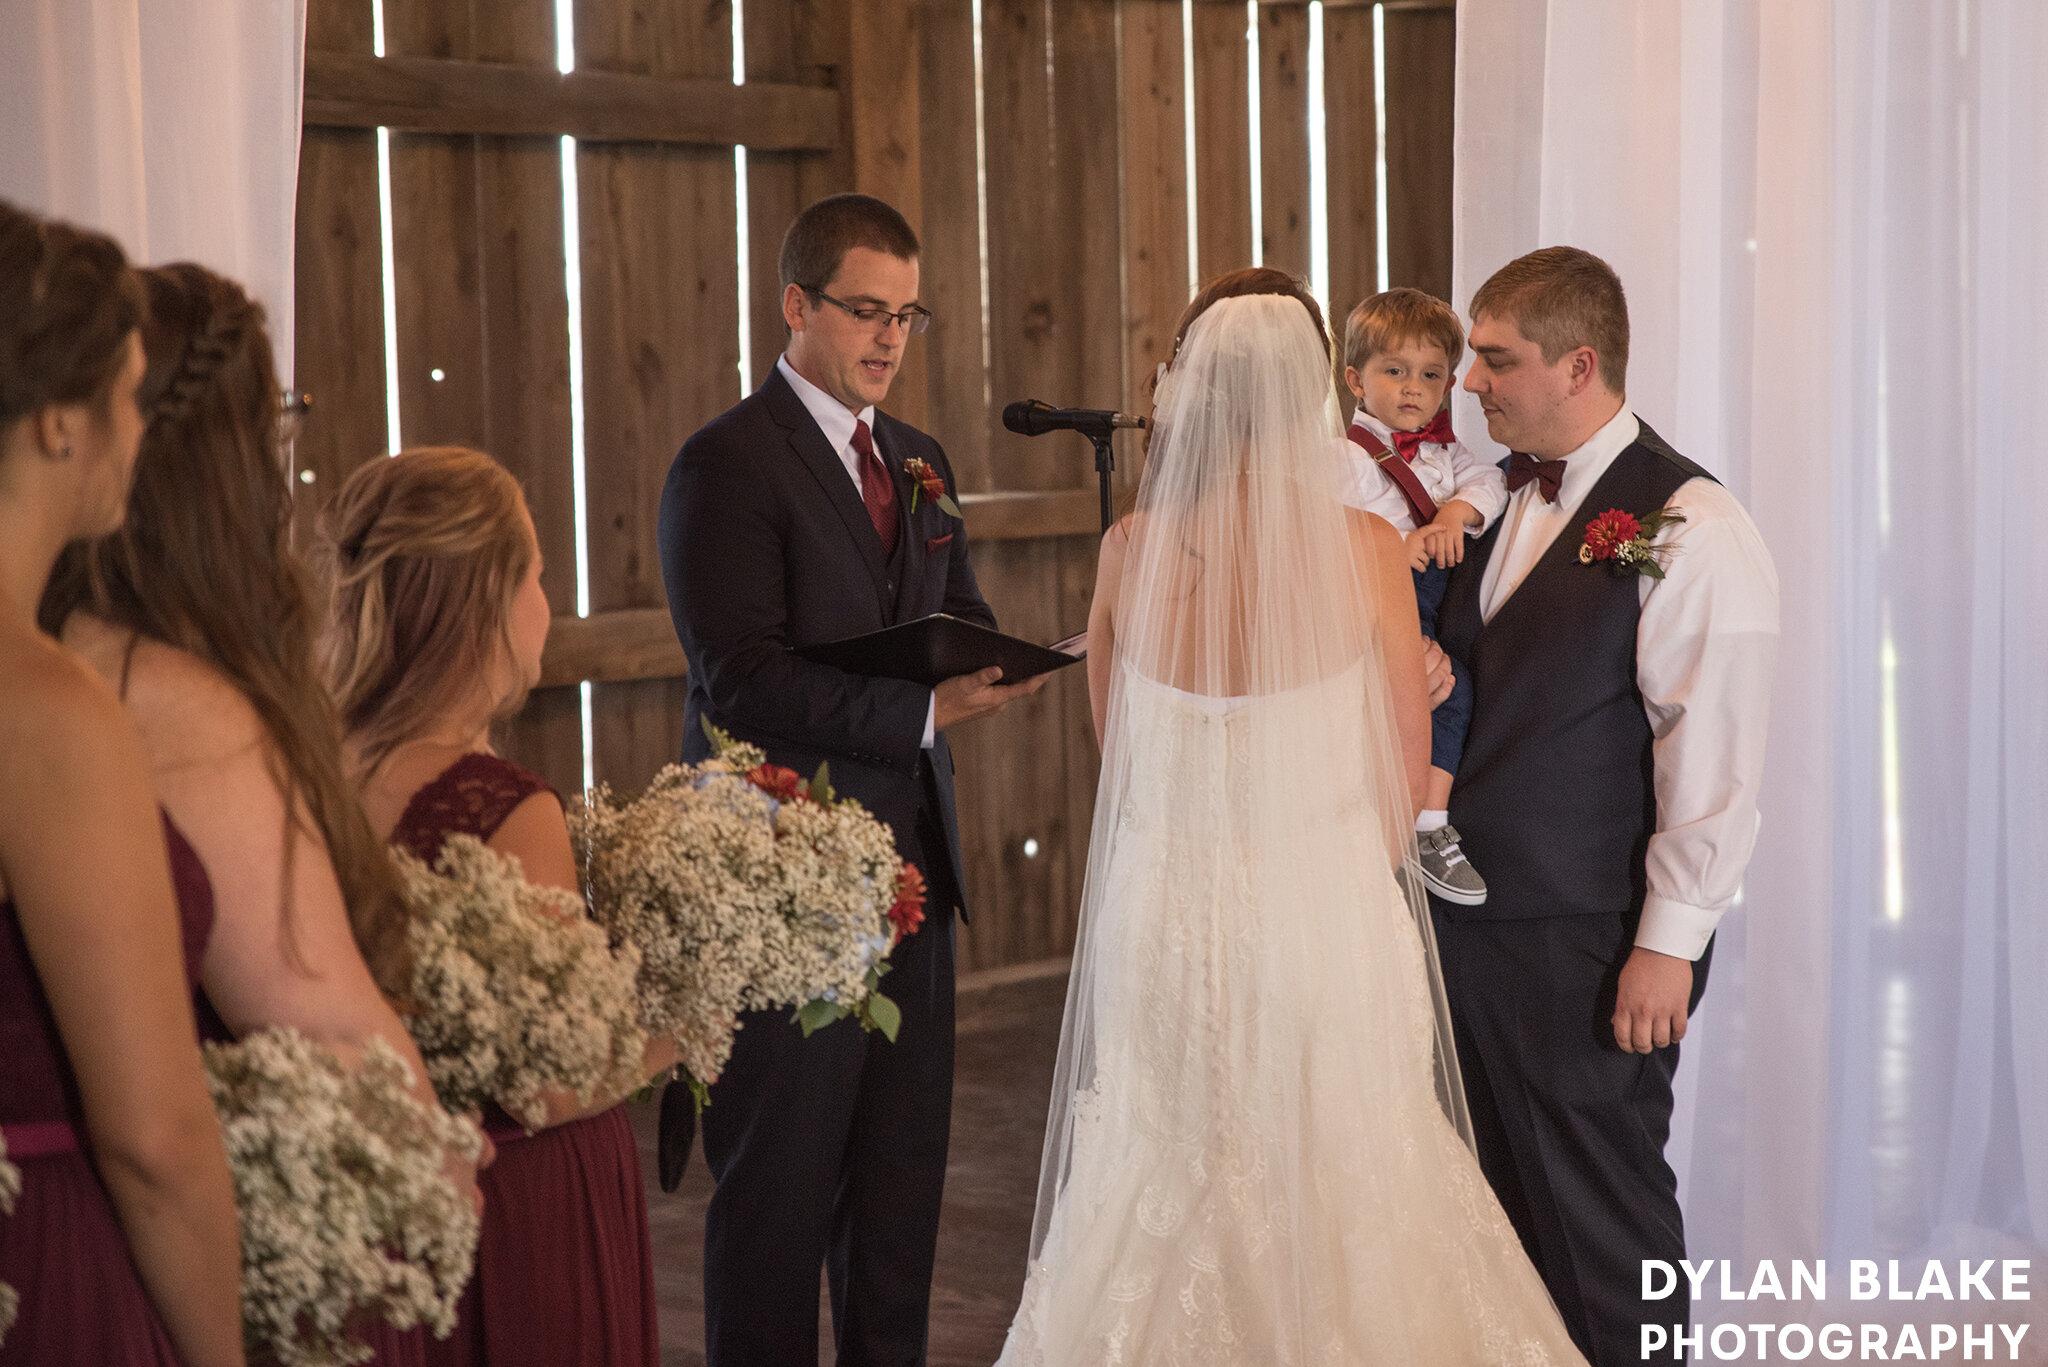 ryan-and-billy-brighton-acres-wedding0018.jpg